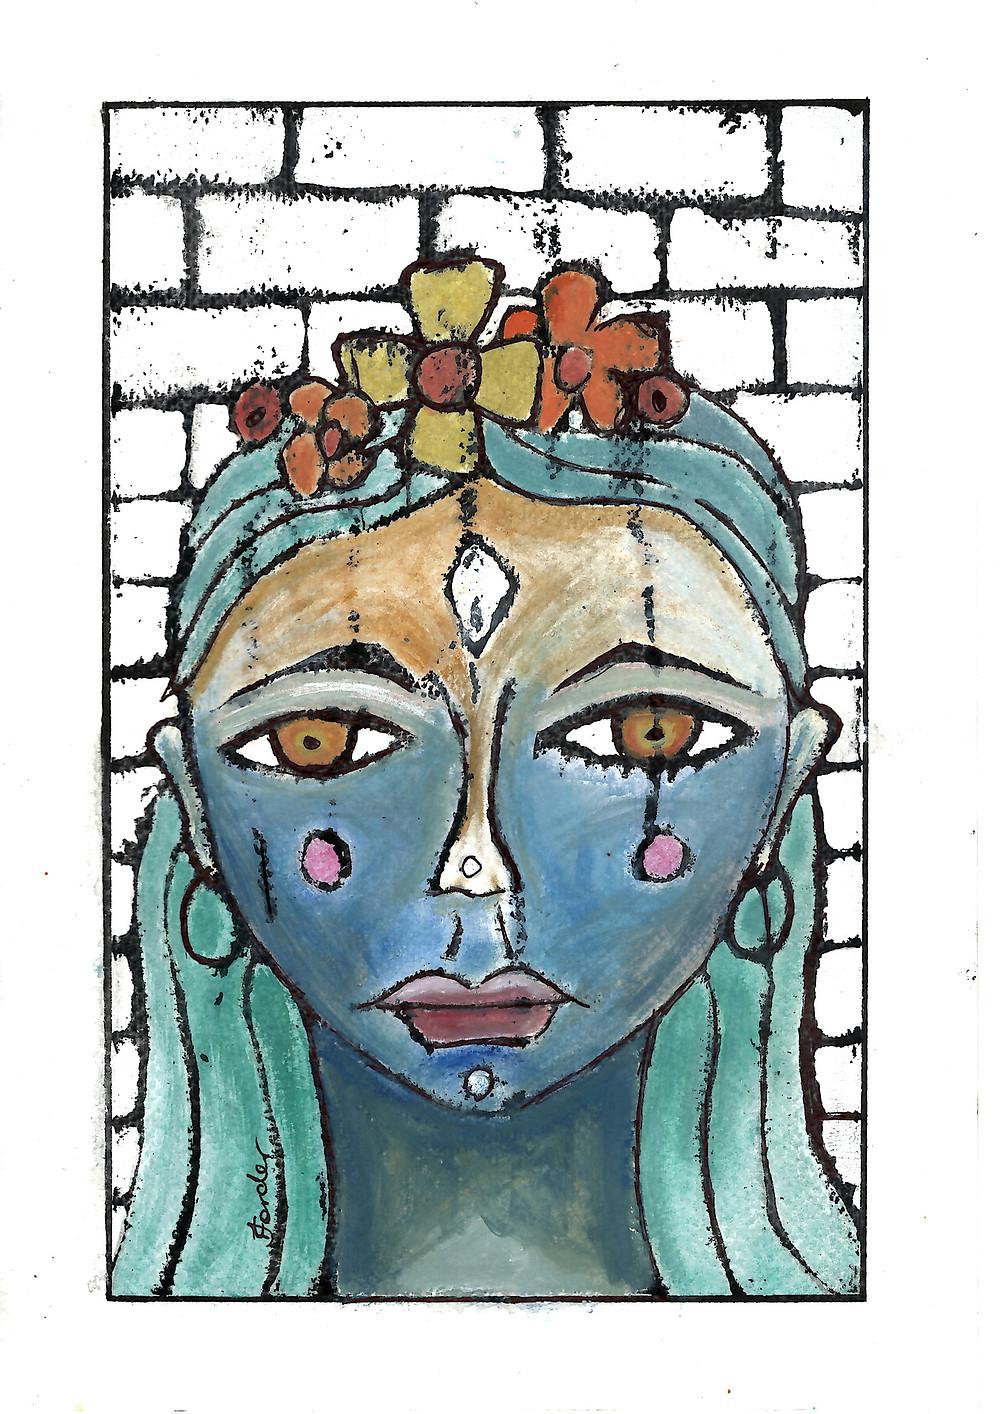 mosaic painted gypsy woman